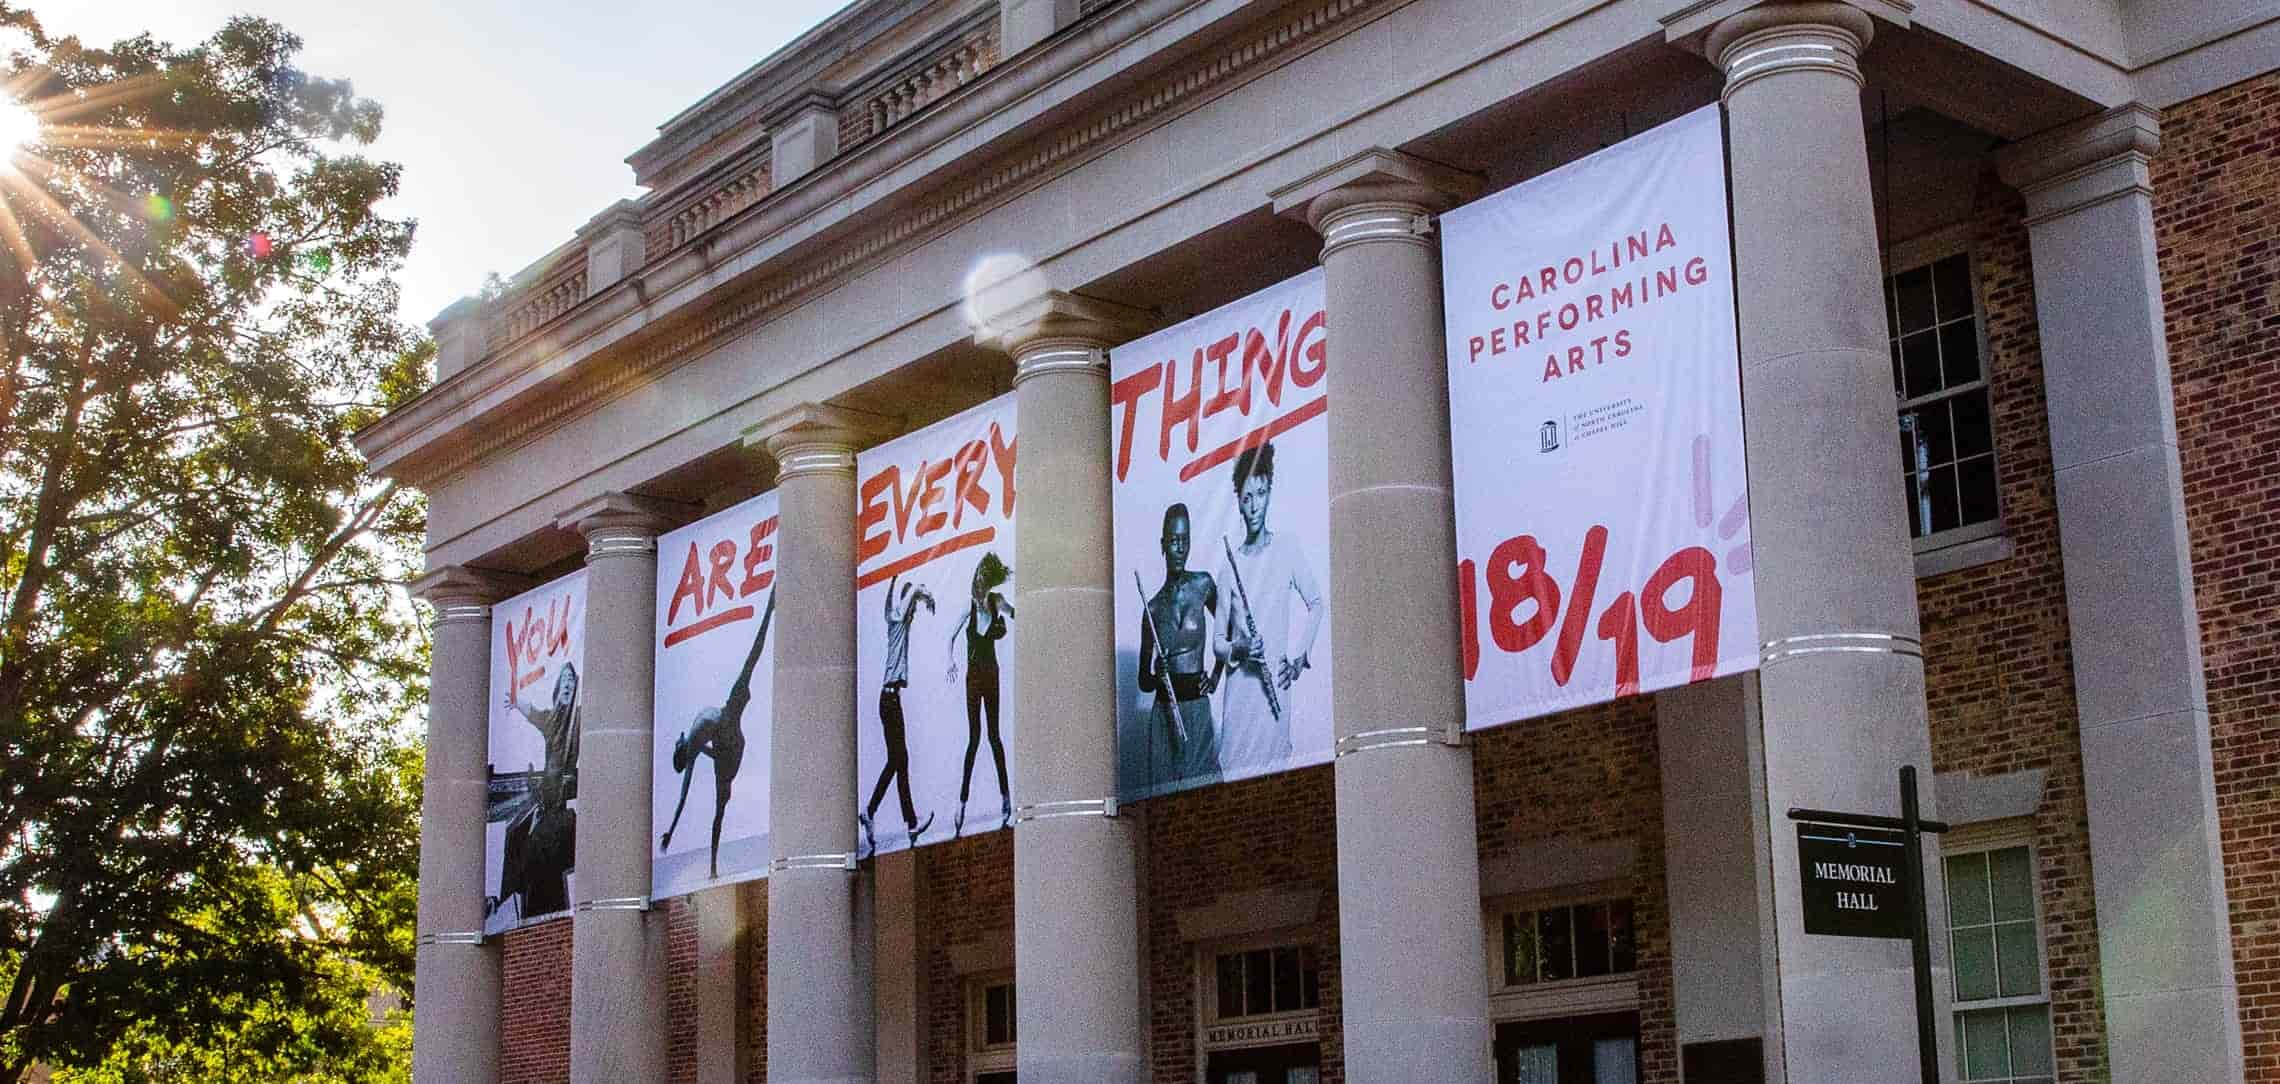 Carolina Performing Arts Building